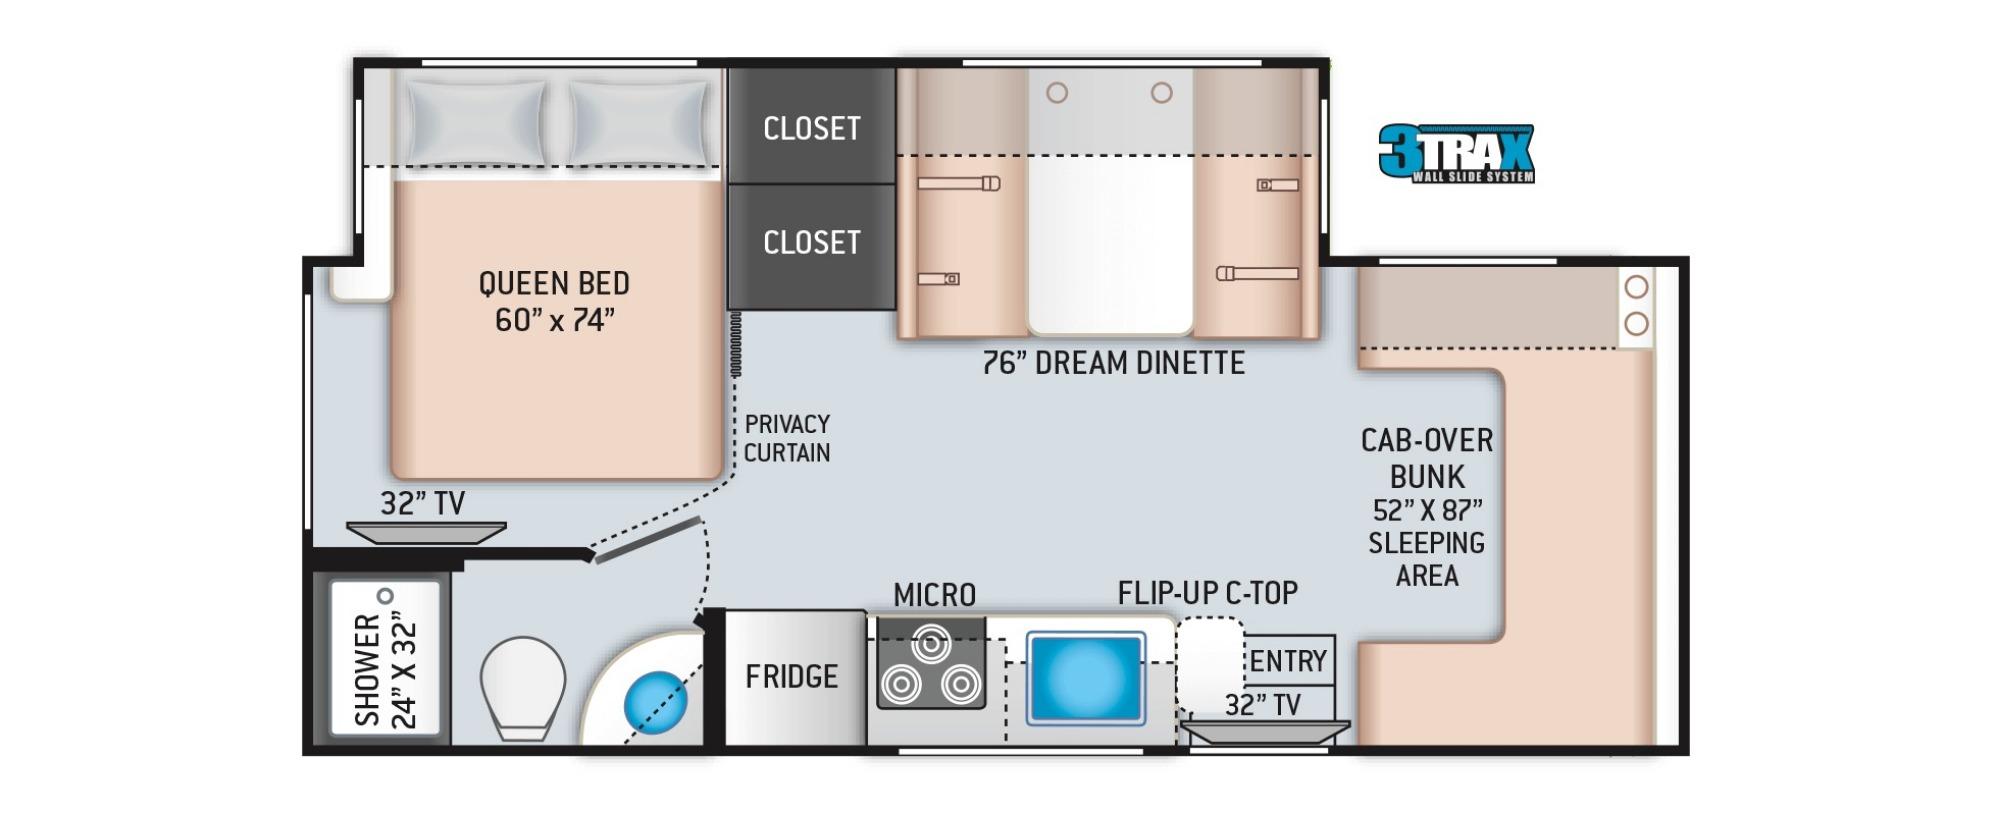 View Floor Plan for 2020 THOR FREEDOM ELITE 24FE